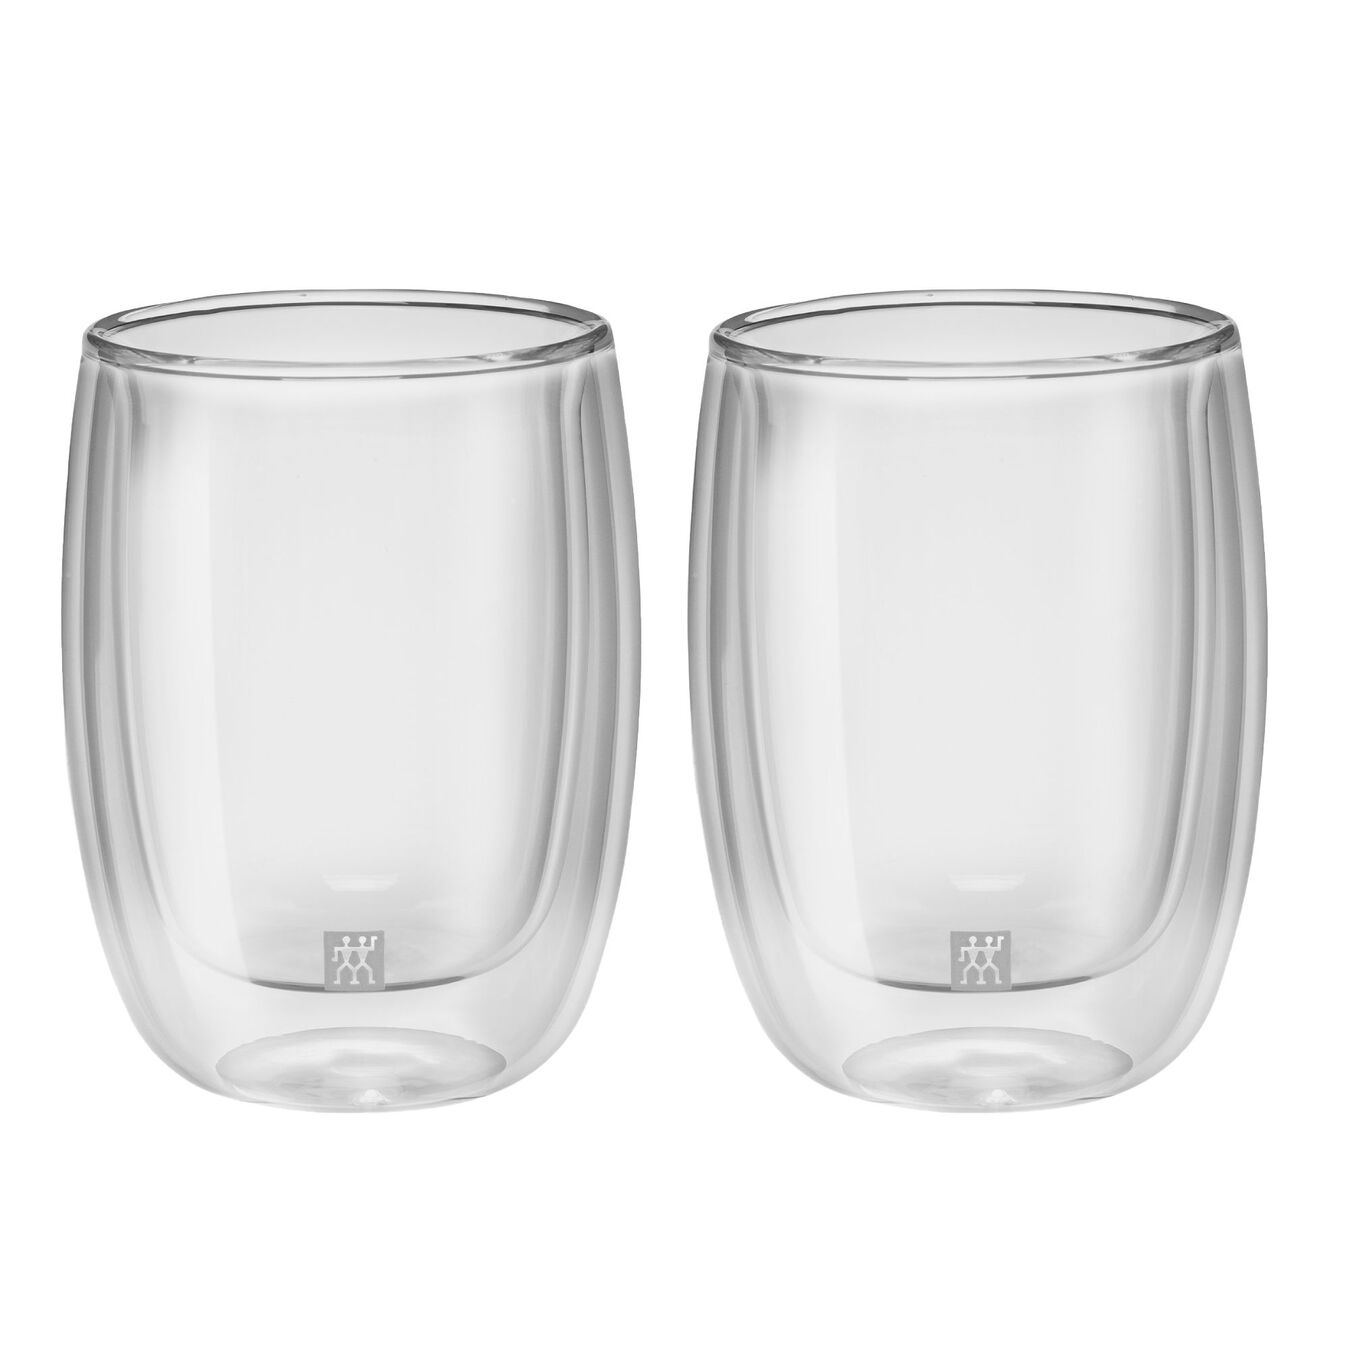 Çift Camlı Kahve bardağı seti, 2-parça,,large 1